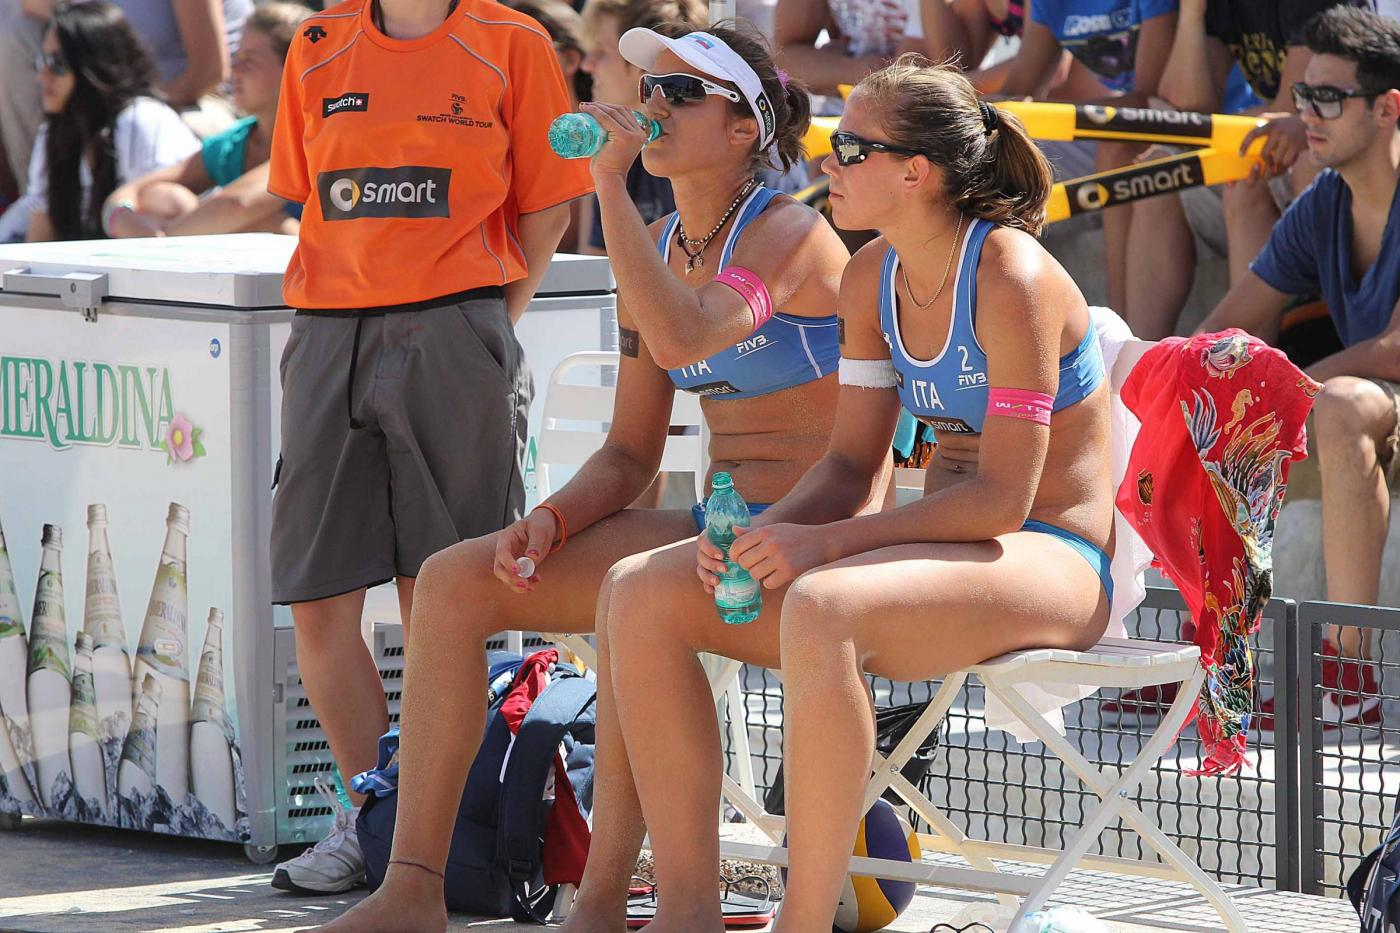 Olimpiadi 2016, beach volley: Orsi Toth positiva a controlli anti doping